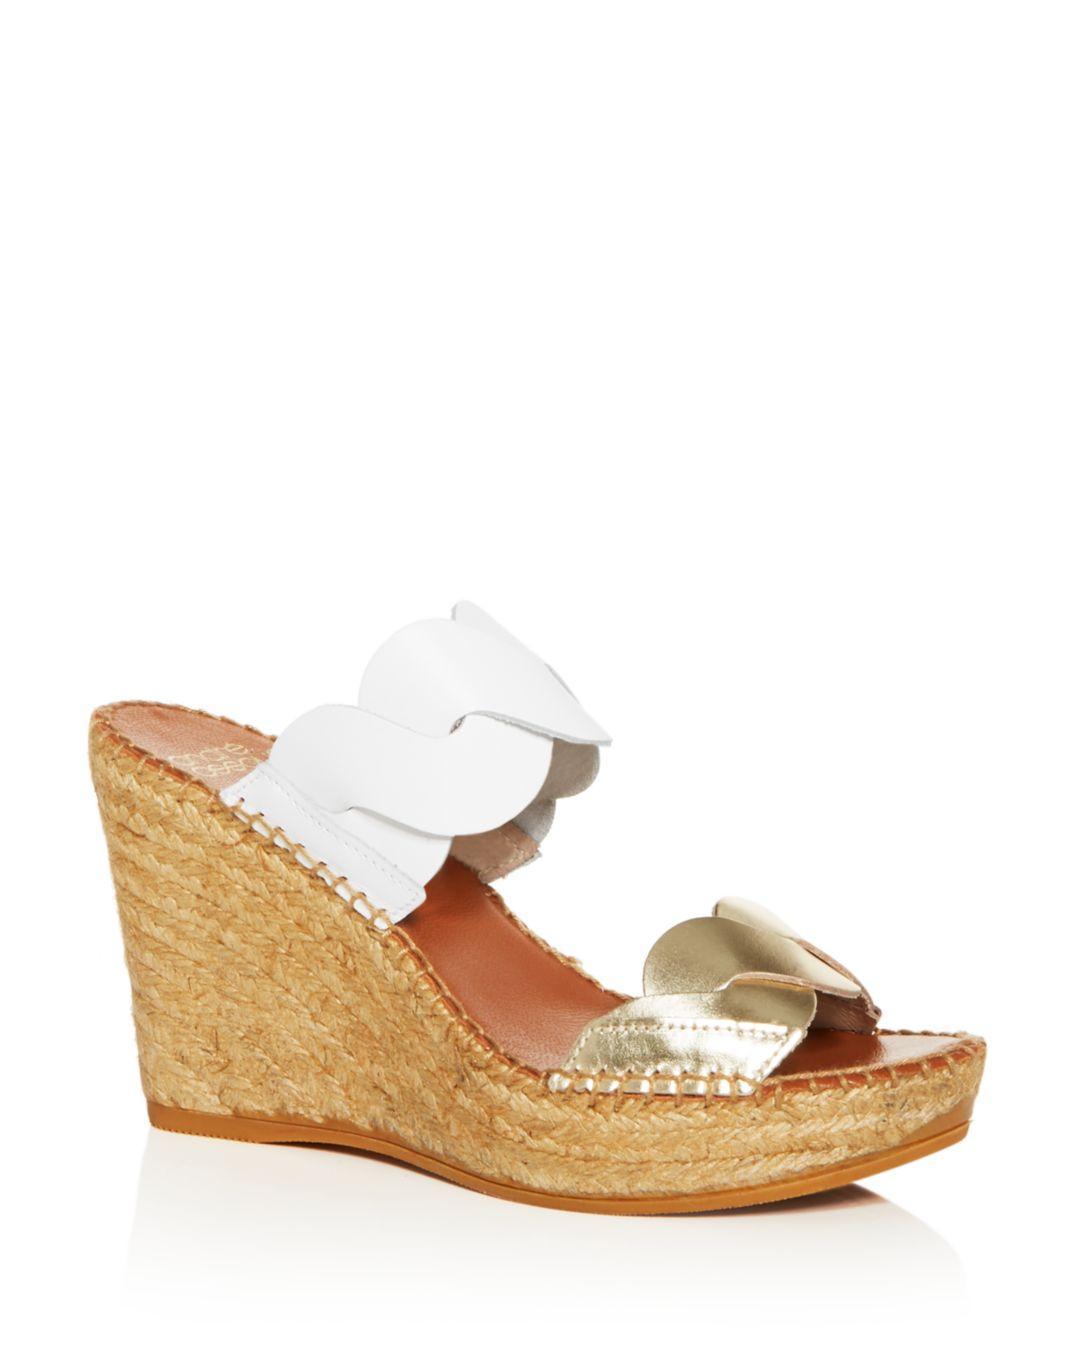 b6bb3687d1f Women's Rumy Platform Wedge Espadrille Side Sandals